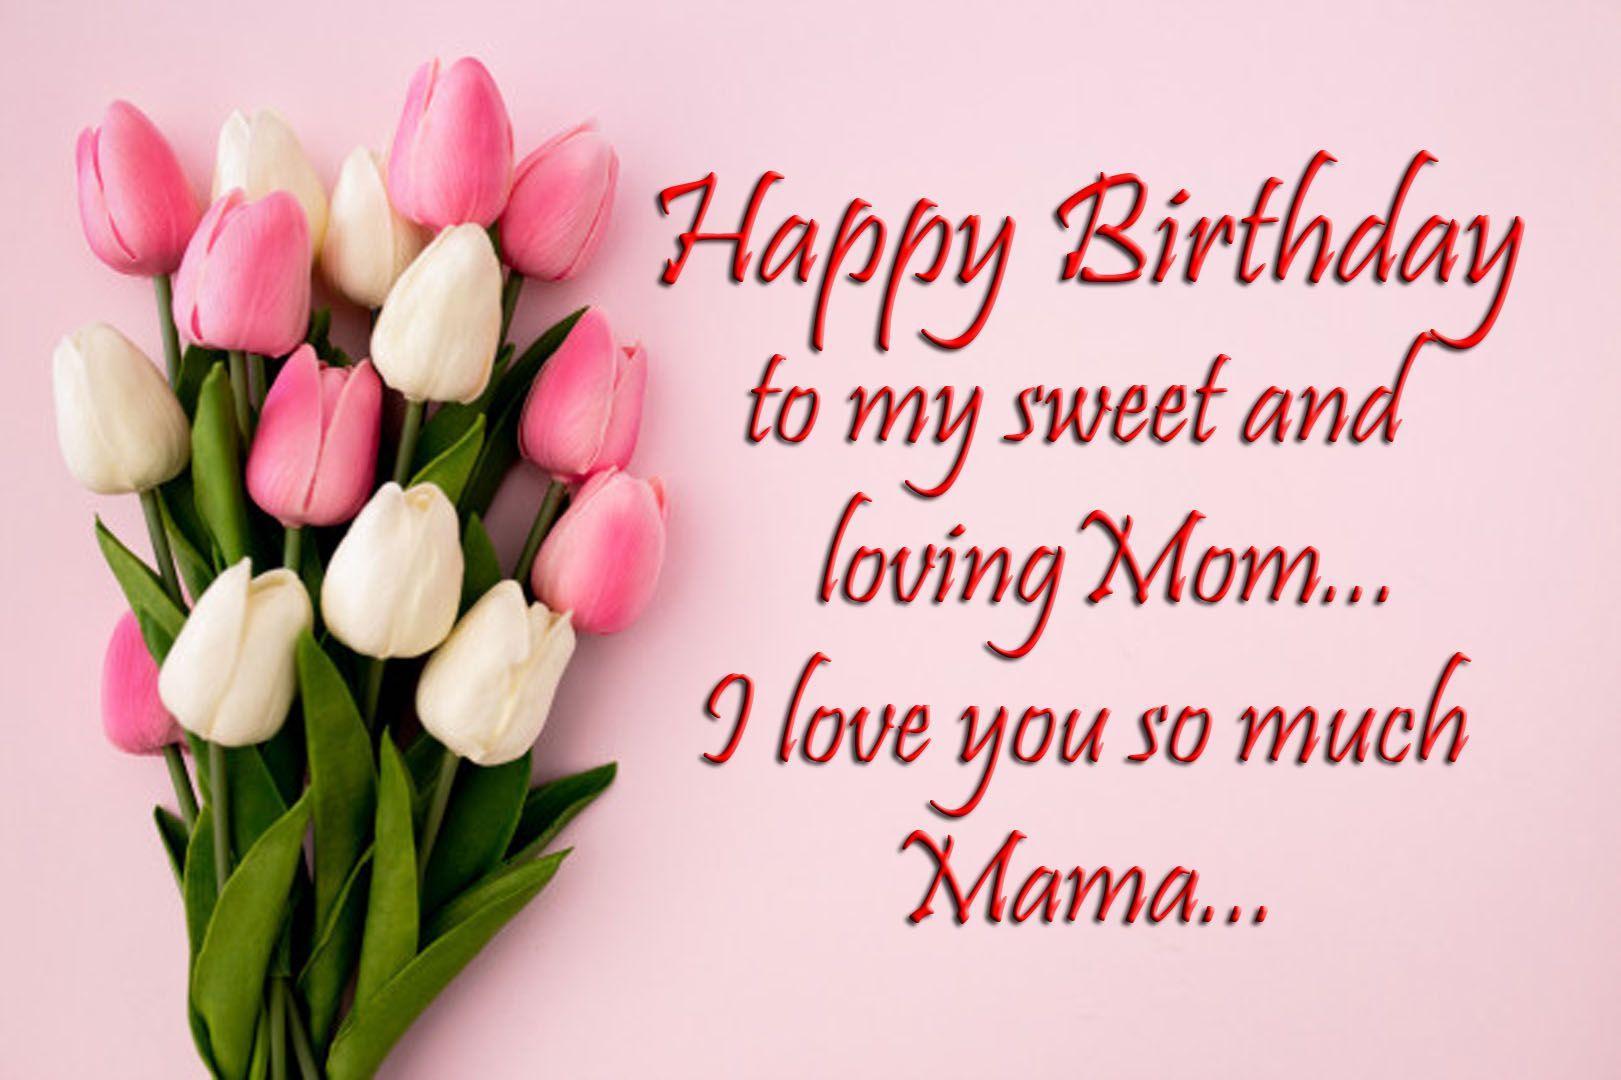 Happy Birthday Mom Birthday Wishes For Mother Birthday Wishes For Mom Happy Birthday Mom Images Birthday Wishes For Mother